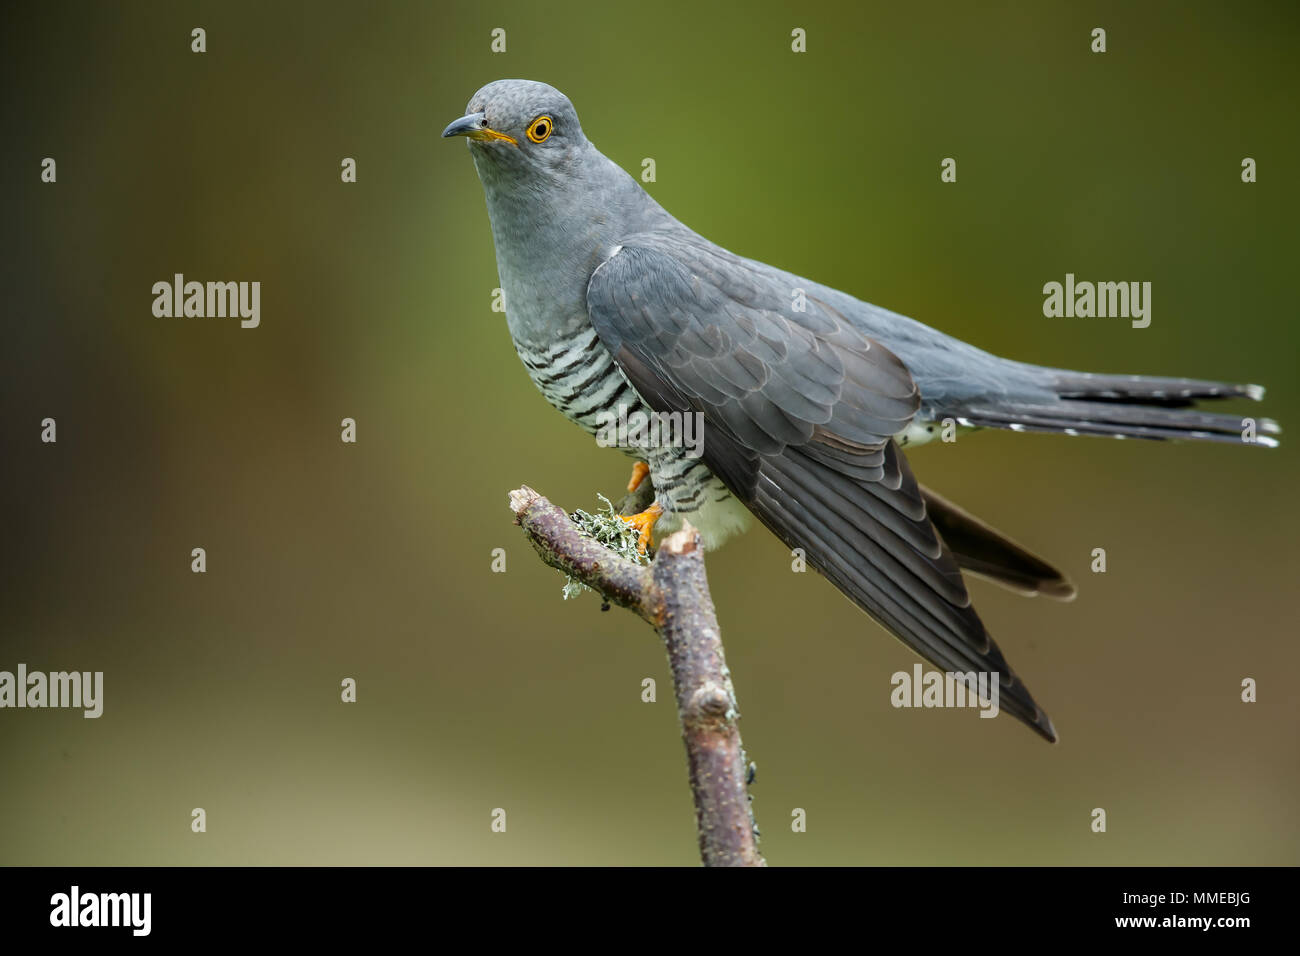 An Eurasian or Common cuckoo - Stock Image